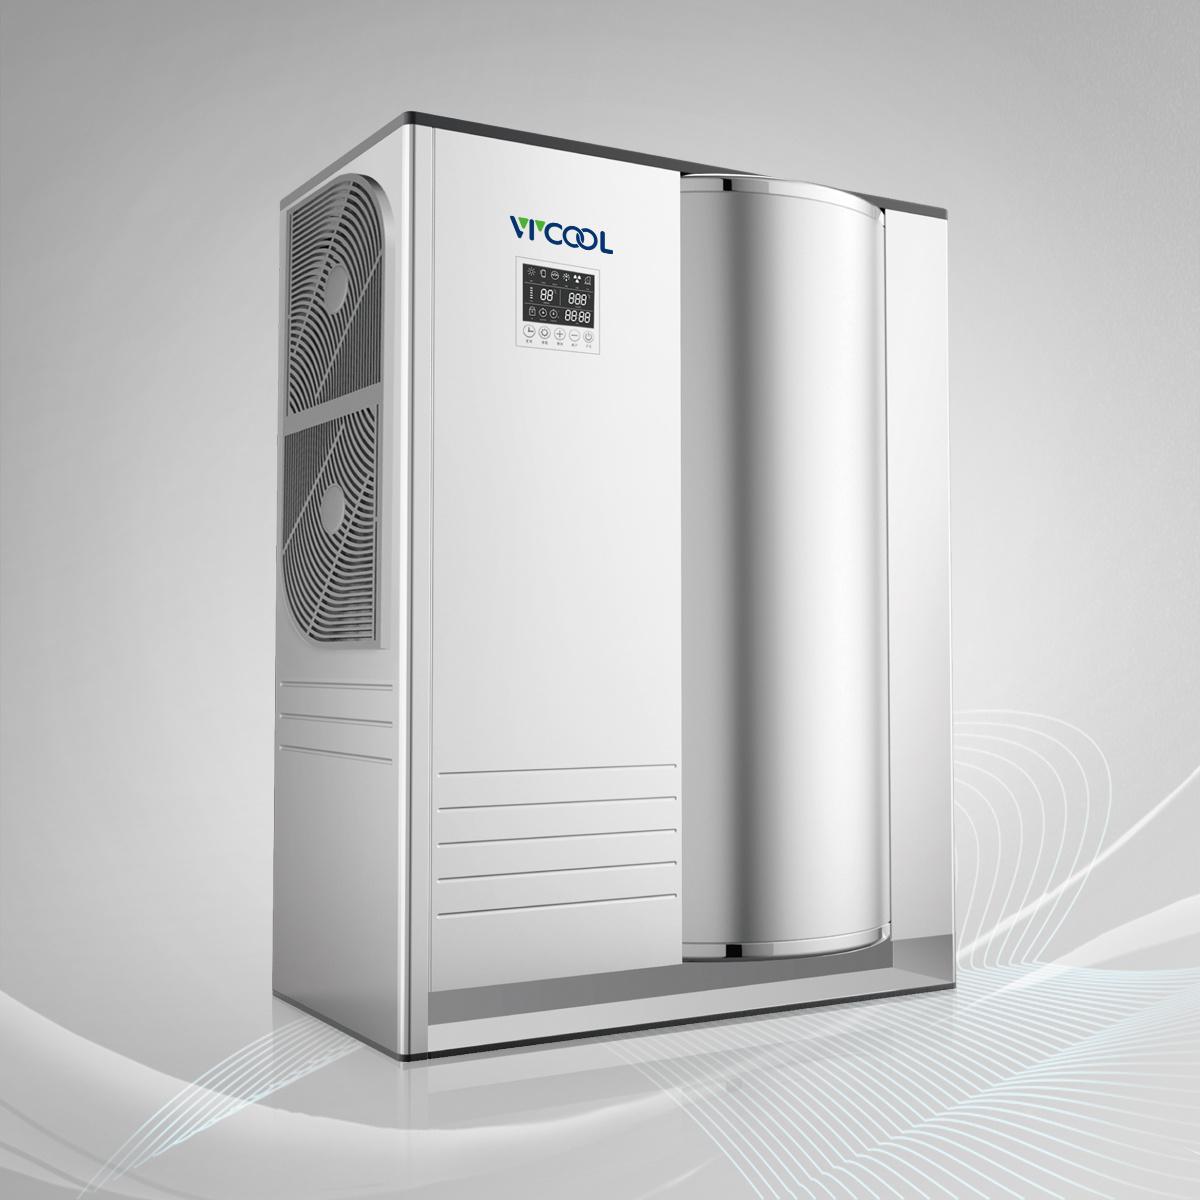 Air to Water Heat Pump Water Heater Monobloc Type